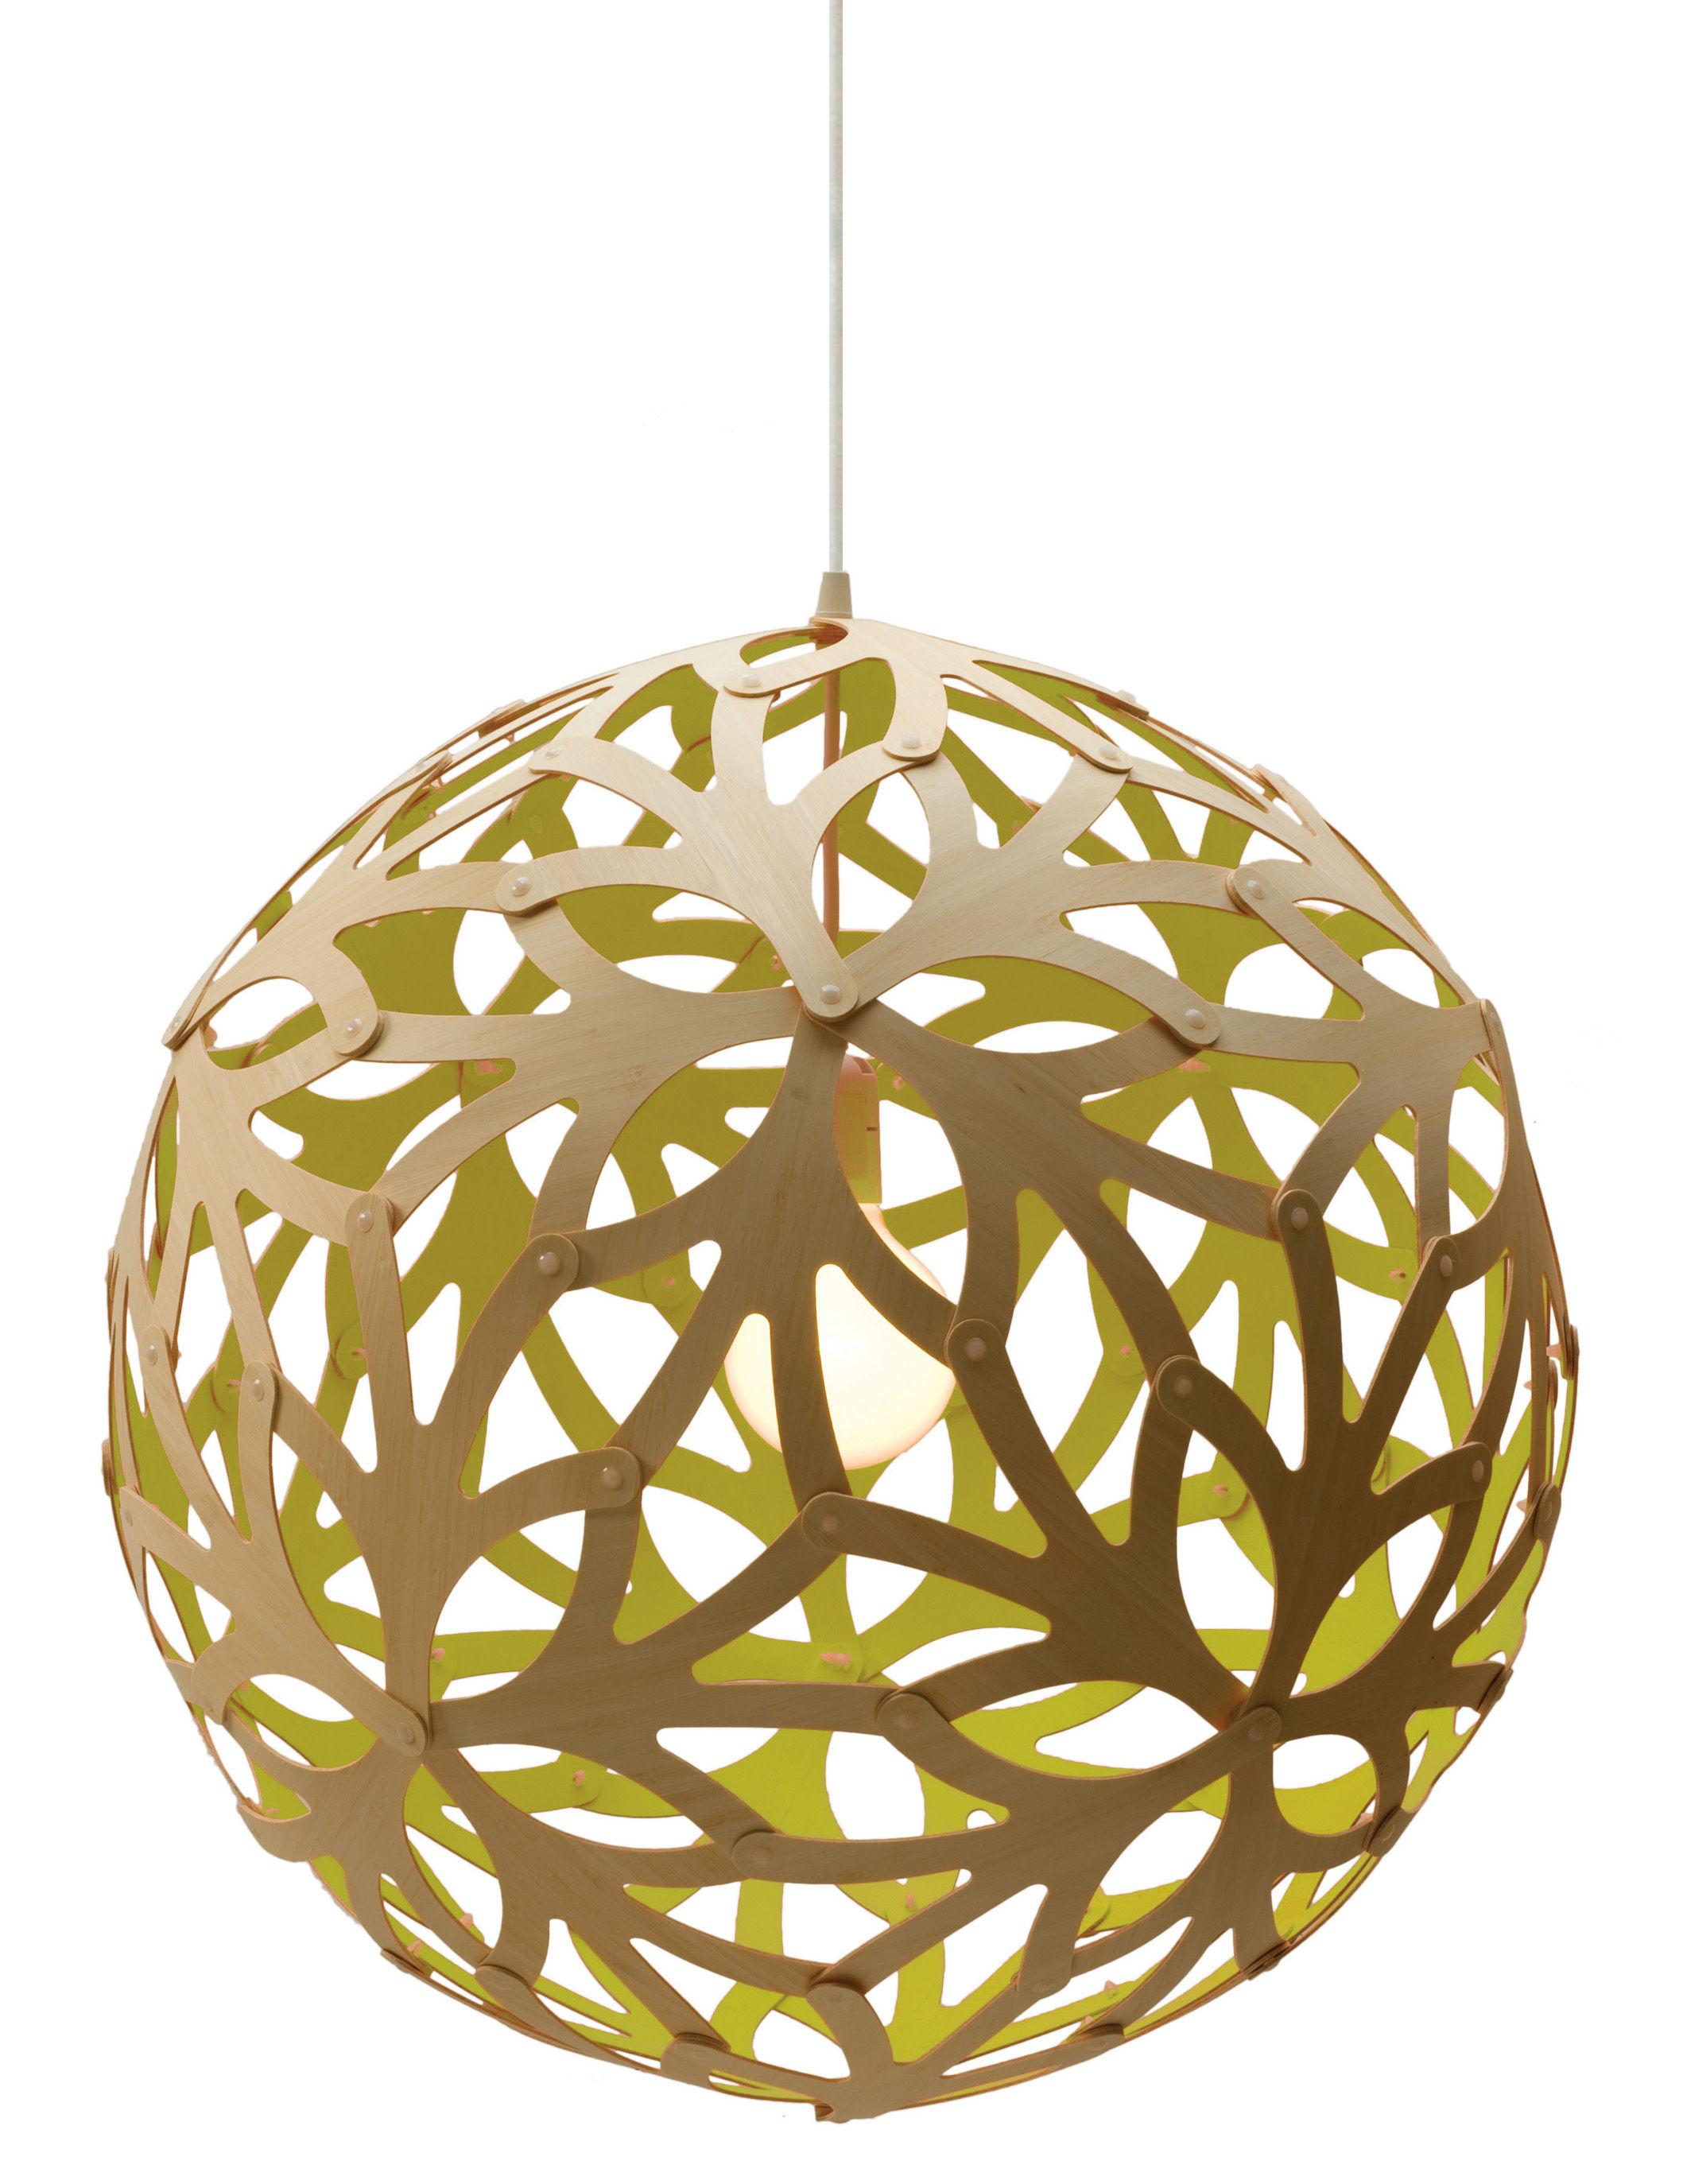 Lighting - Pendant Lighting - Floral Pendant - Ø 60 cm - Bicoloured by David Trubridge - Lime green / Natural wood - Pine